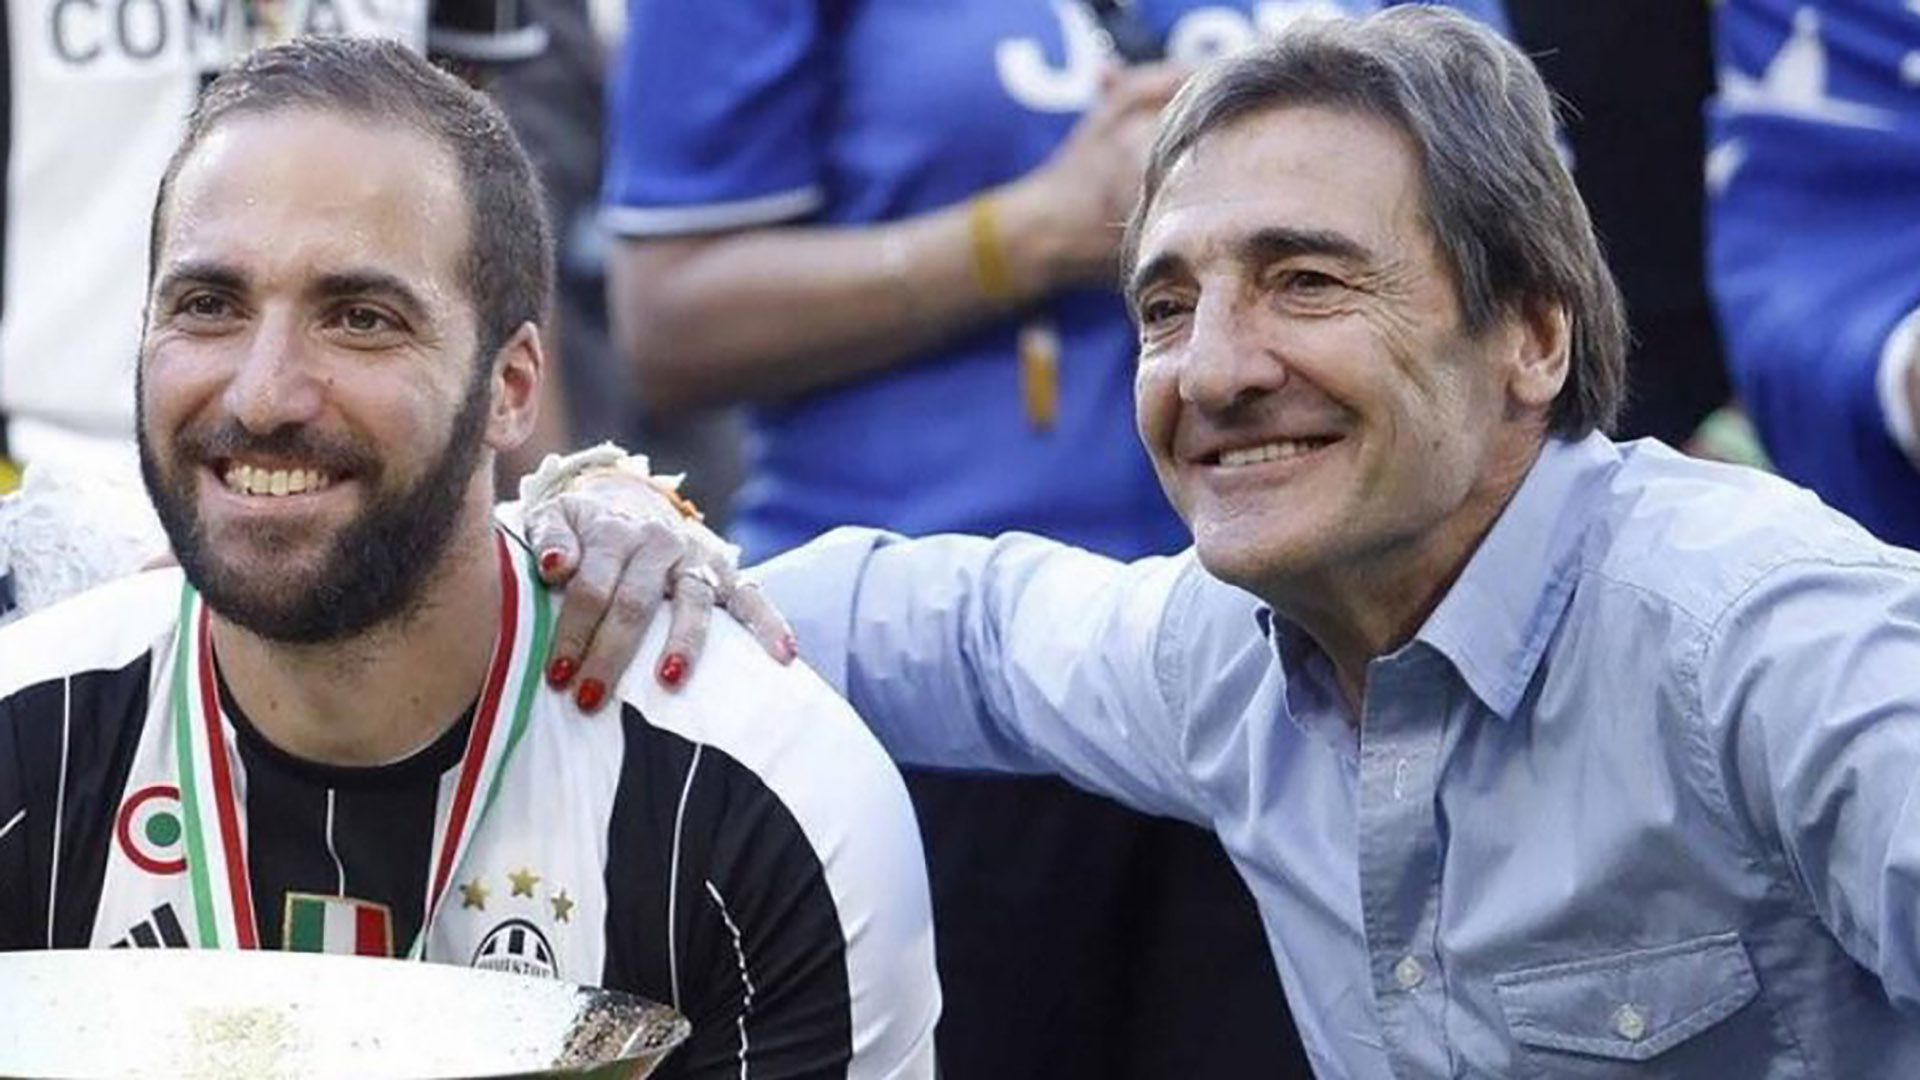 Gonzalo Higuain junto a su padre Jorge Higuain